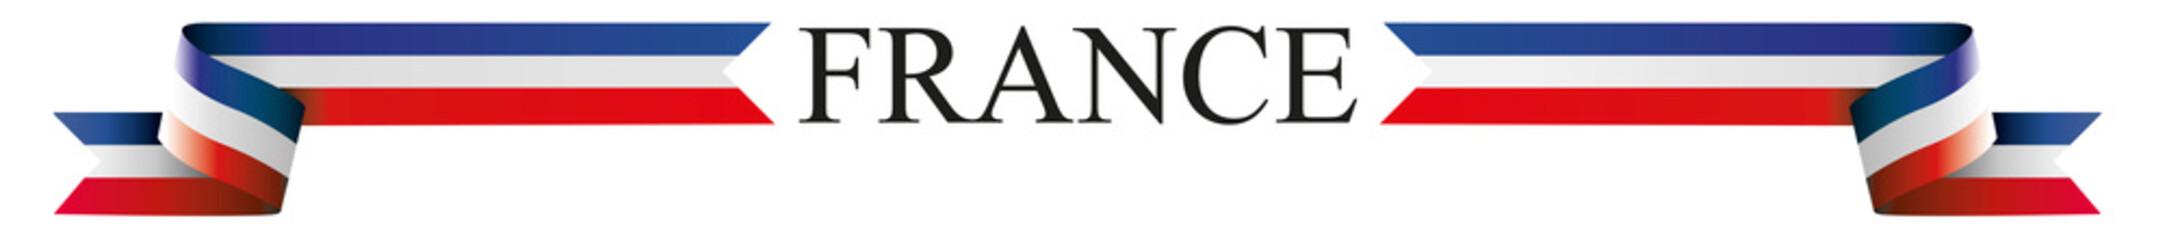 Vector France banner